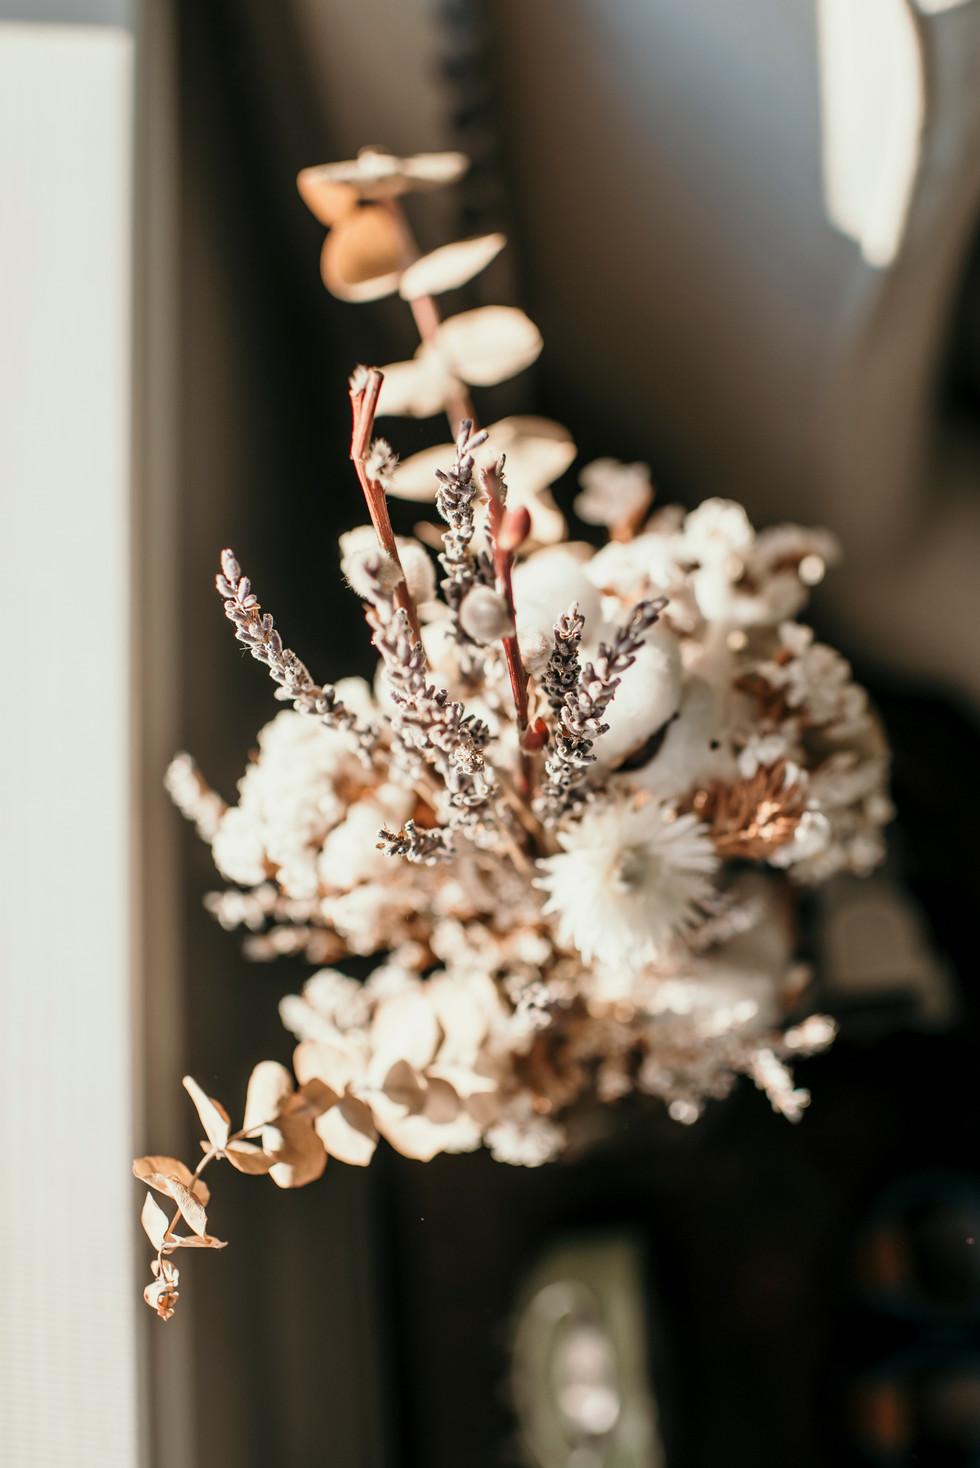 Shelby Rose Photographycam-38.jpg